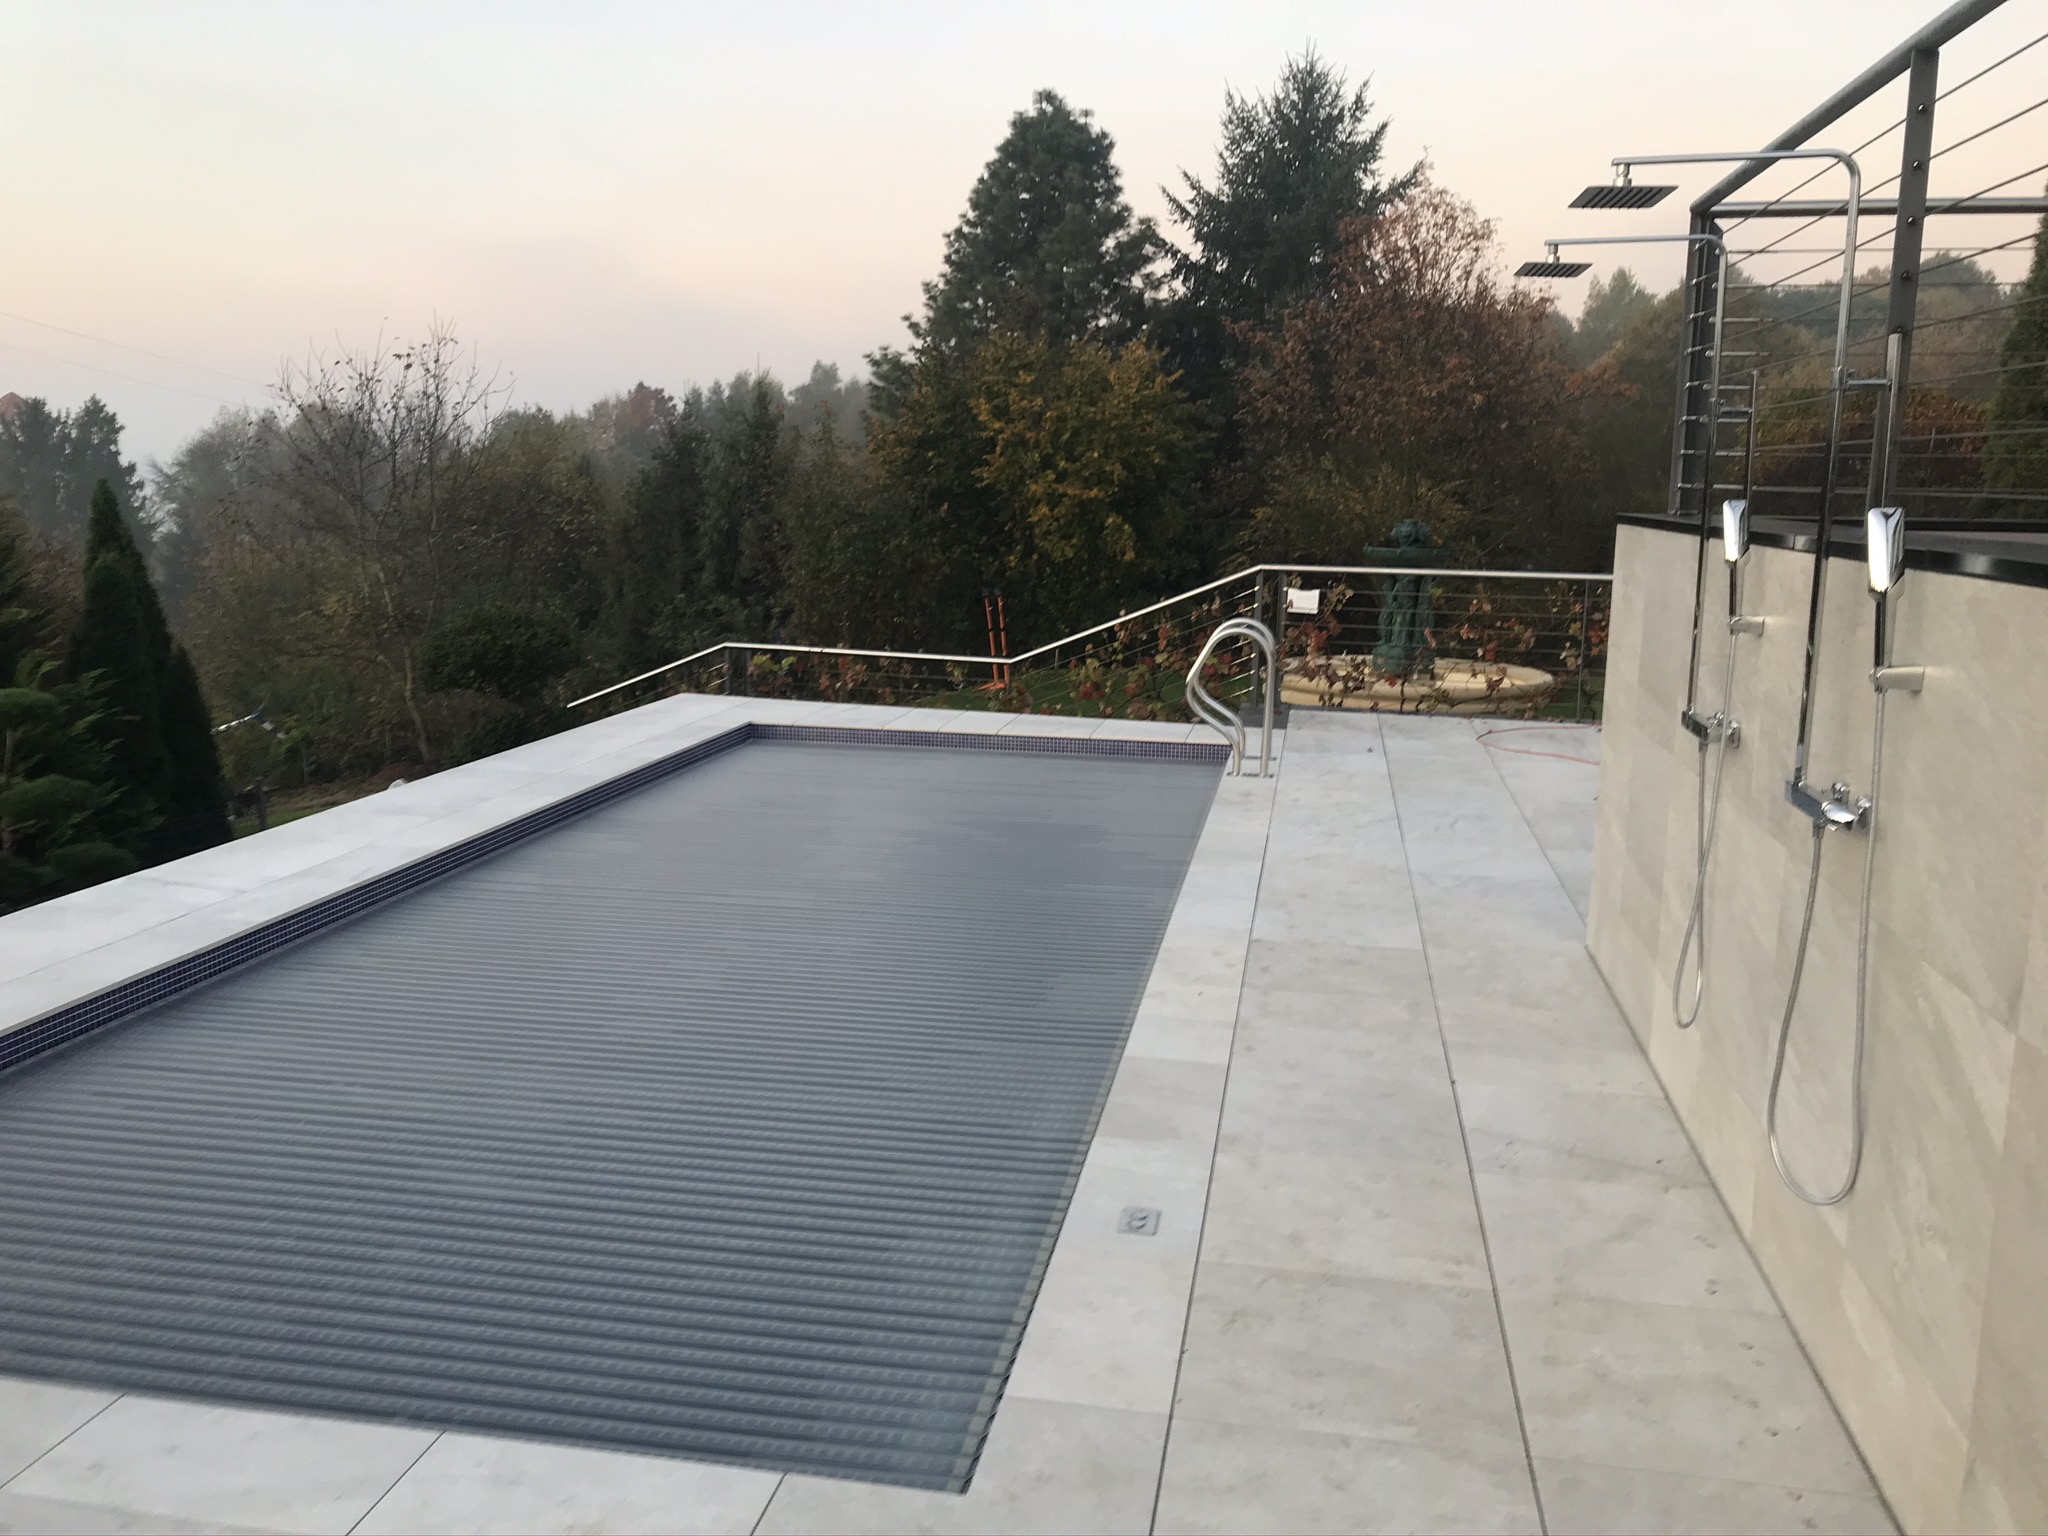 basen-roleta-dno-drabinka-mozaika-budowa basenu-ogrodowy